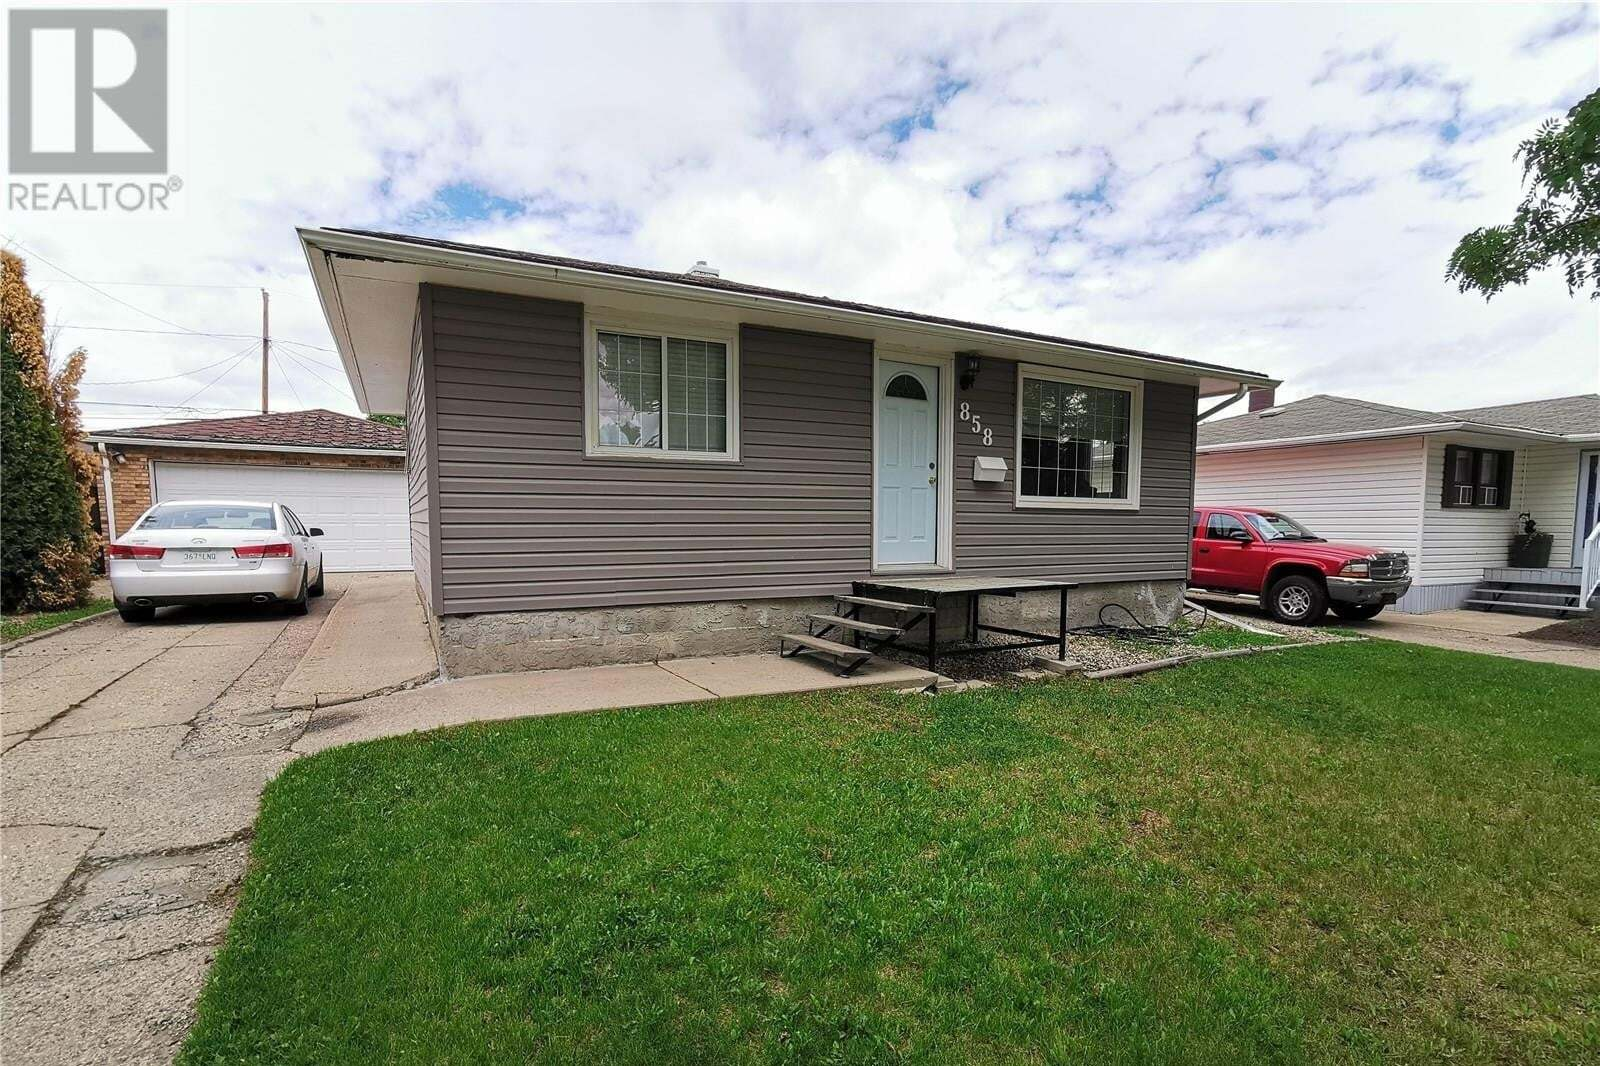 House for sale at 858 Stadacona St W Moose Jaw Saskatchewan - MLS: SK813978